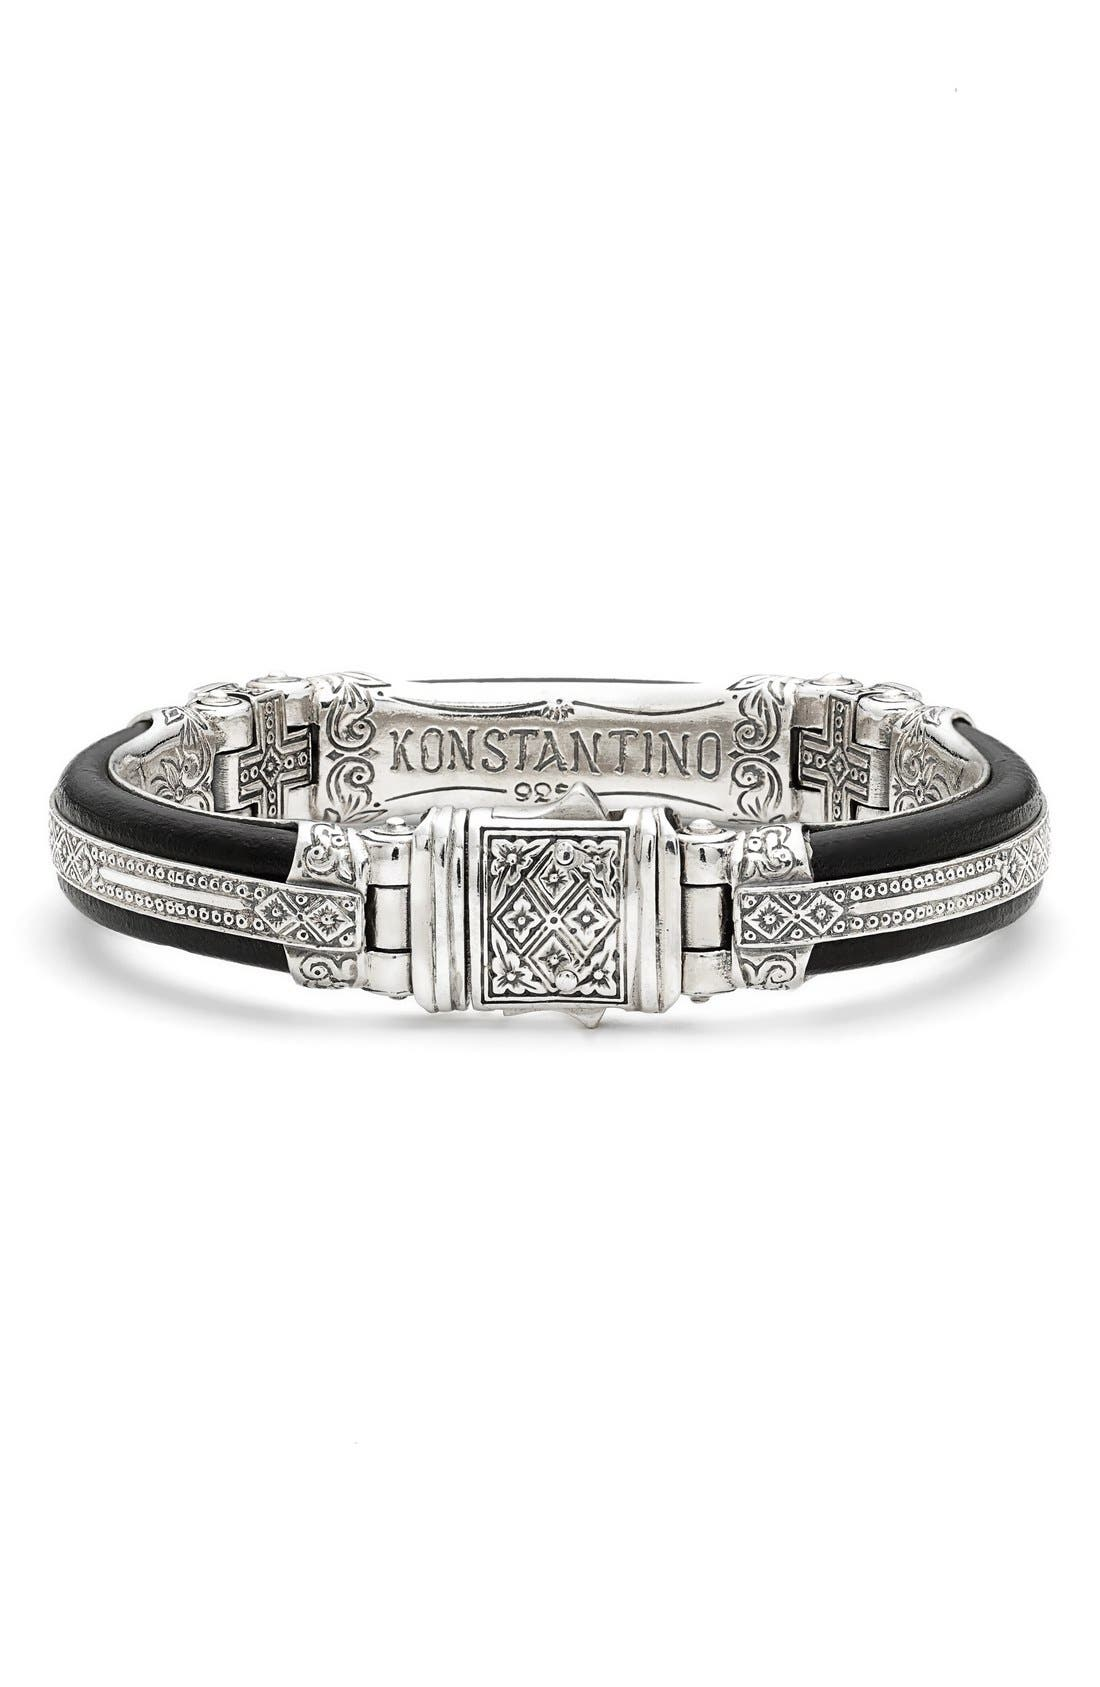 Plato Etched Sterling Silver & Leather Bracelet,                             Alternate thumbnail 2, color,                             040